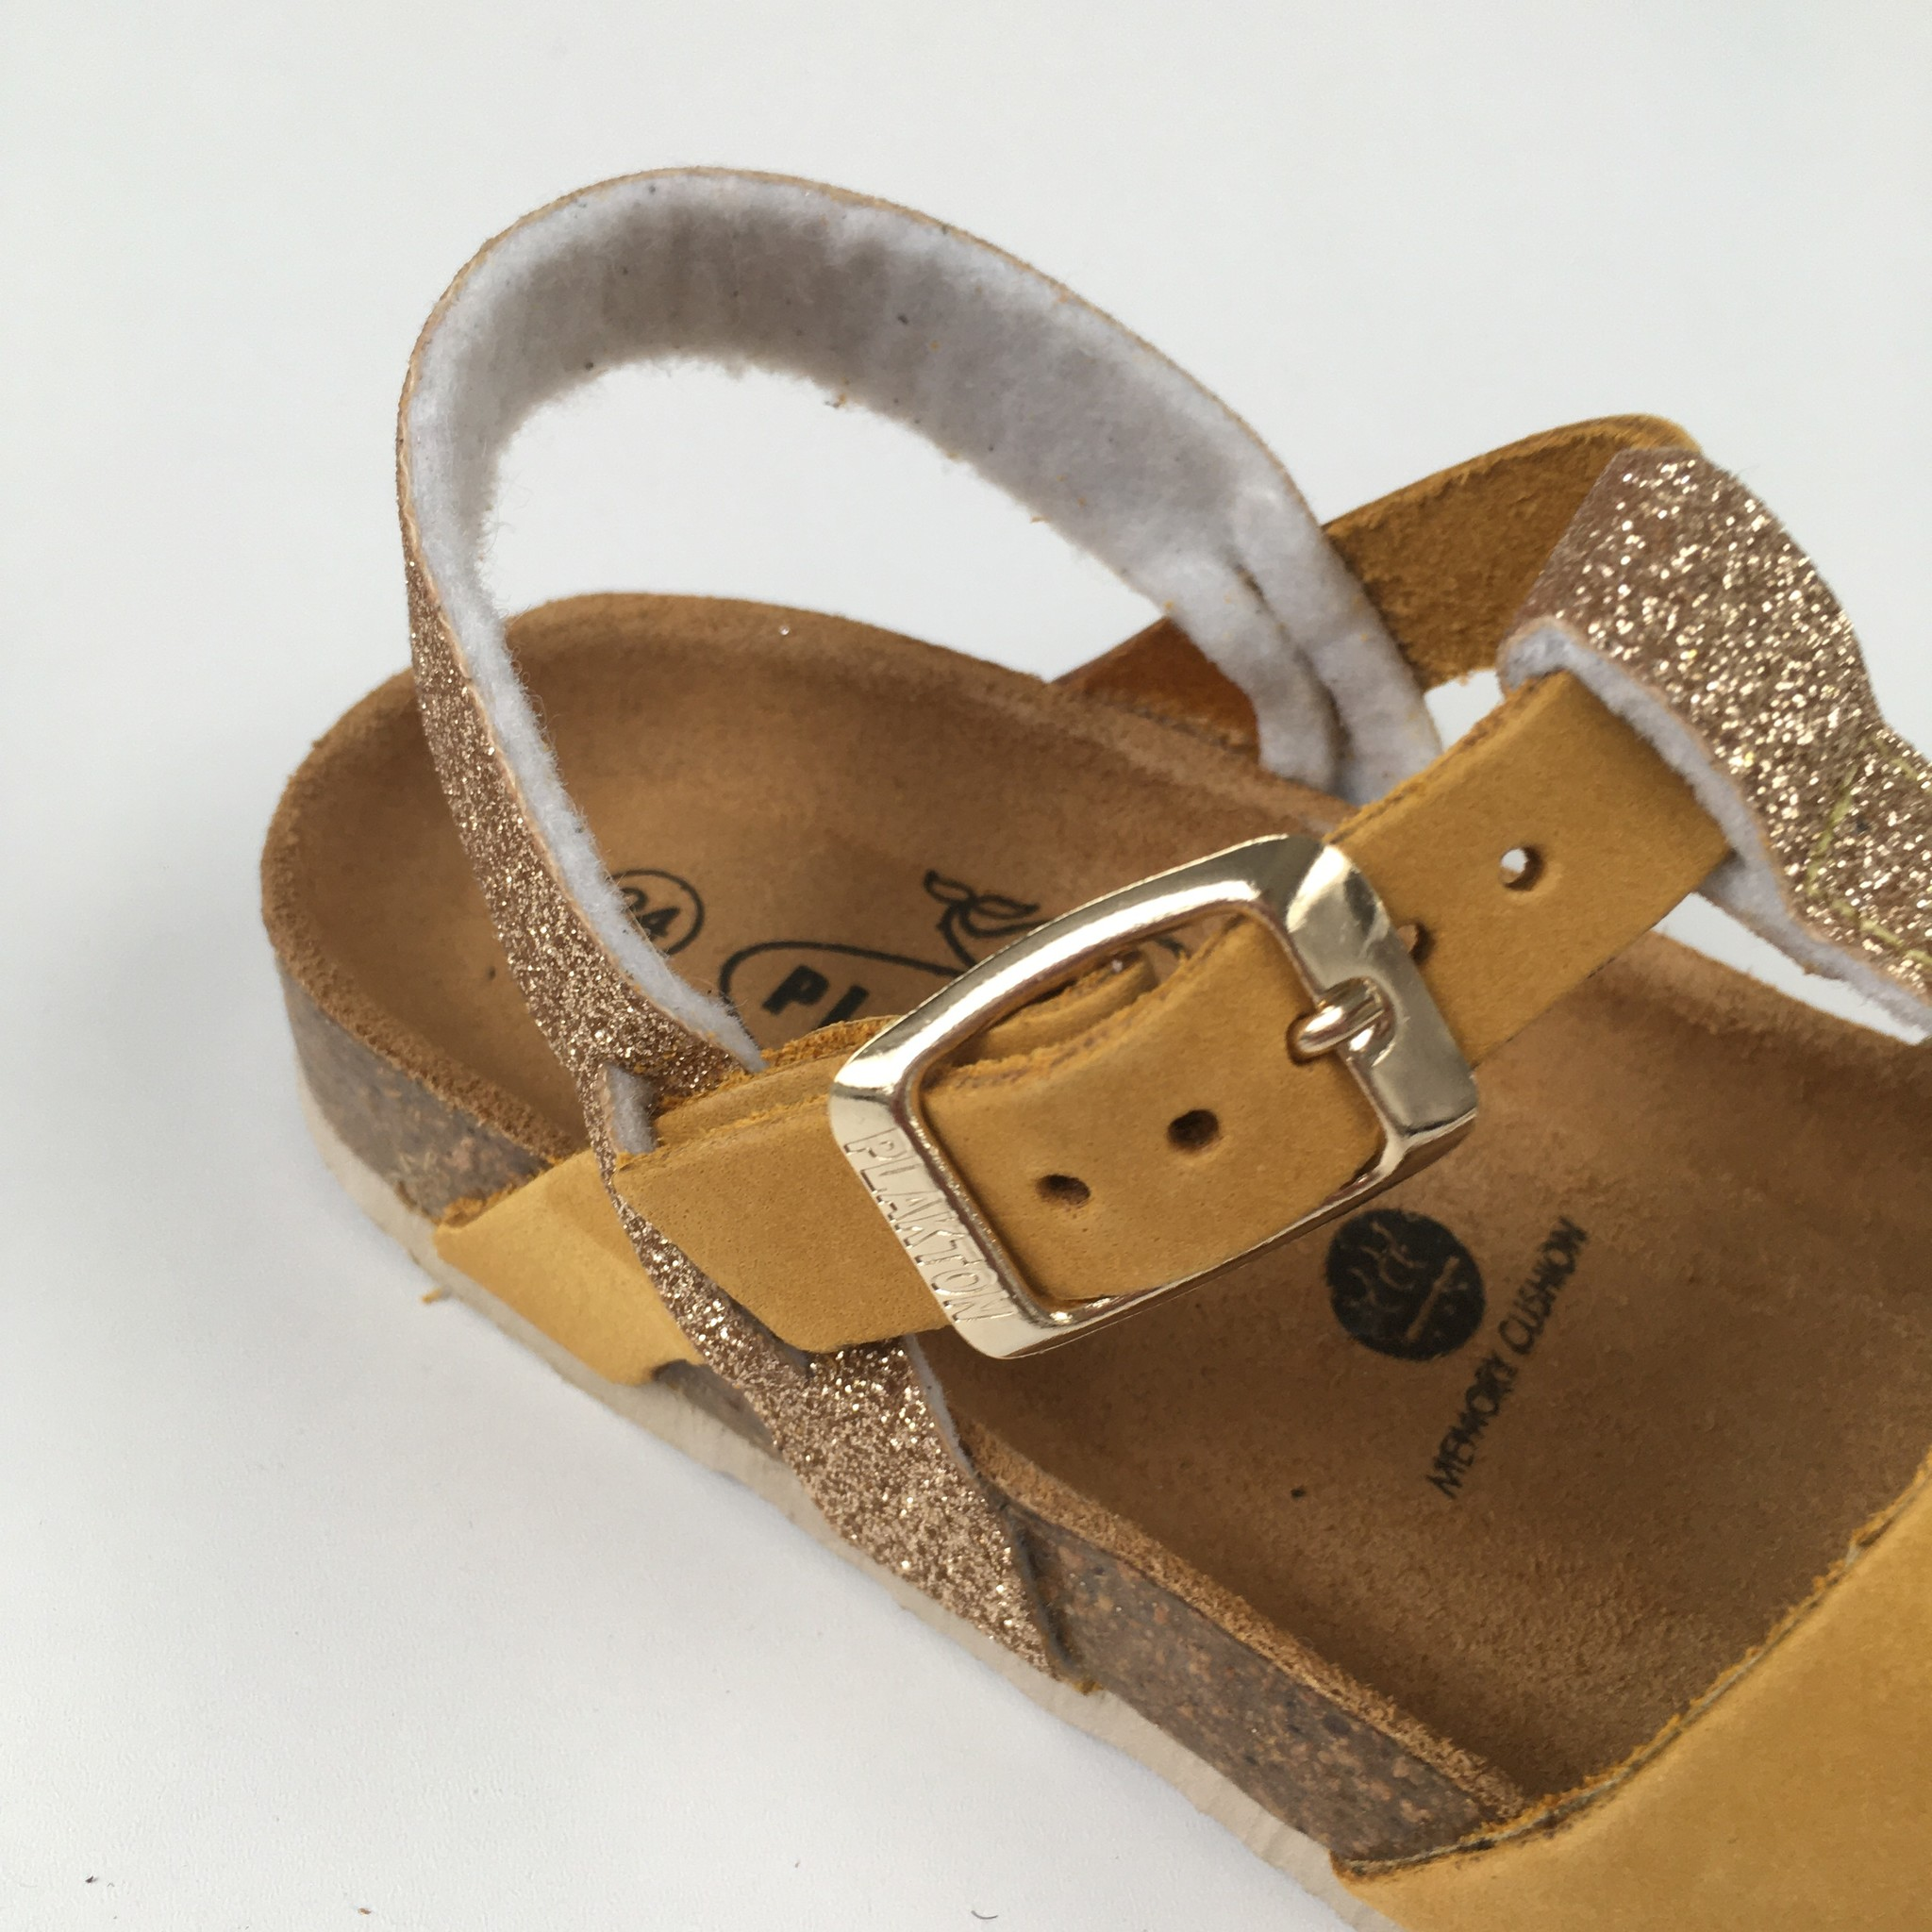 PLAKTON SANDALS leather cork sandal child SENDRA - nubuck mustard yellow / glitter gold - 24 to 35